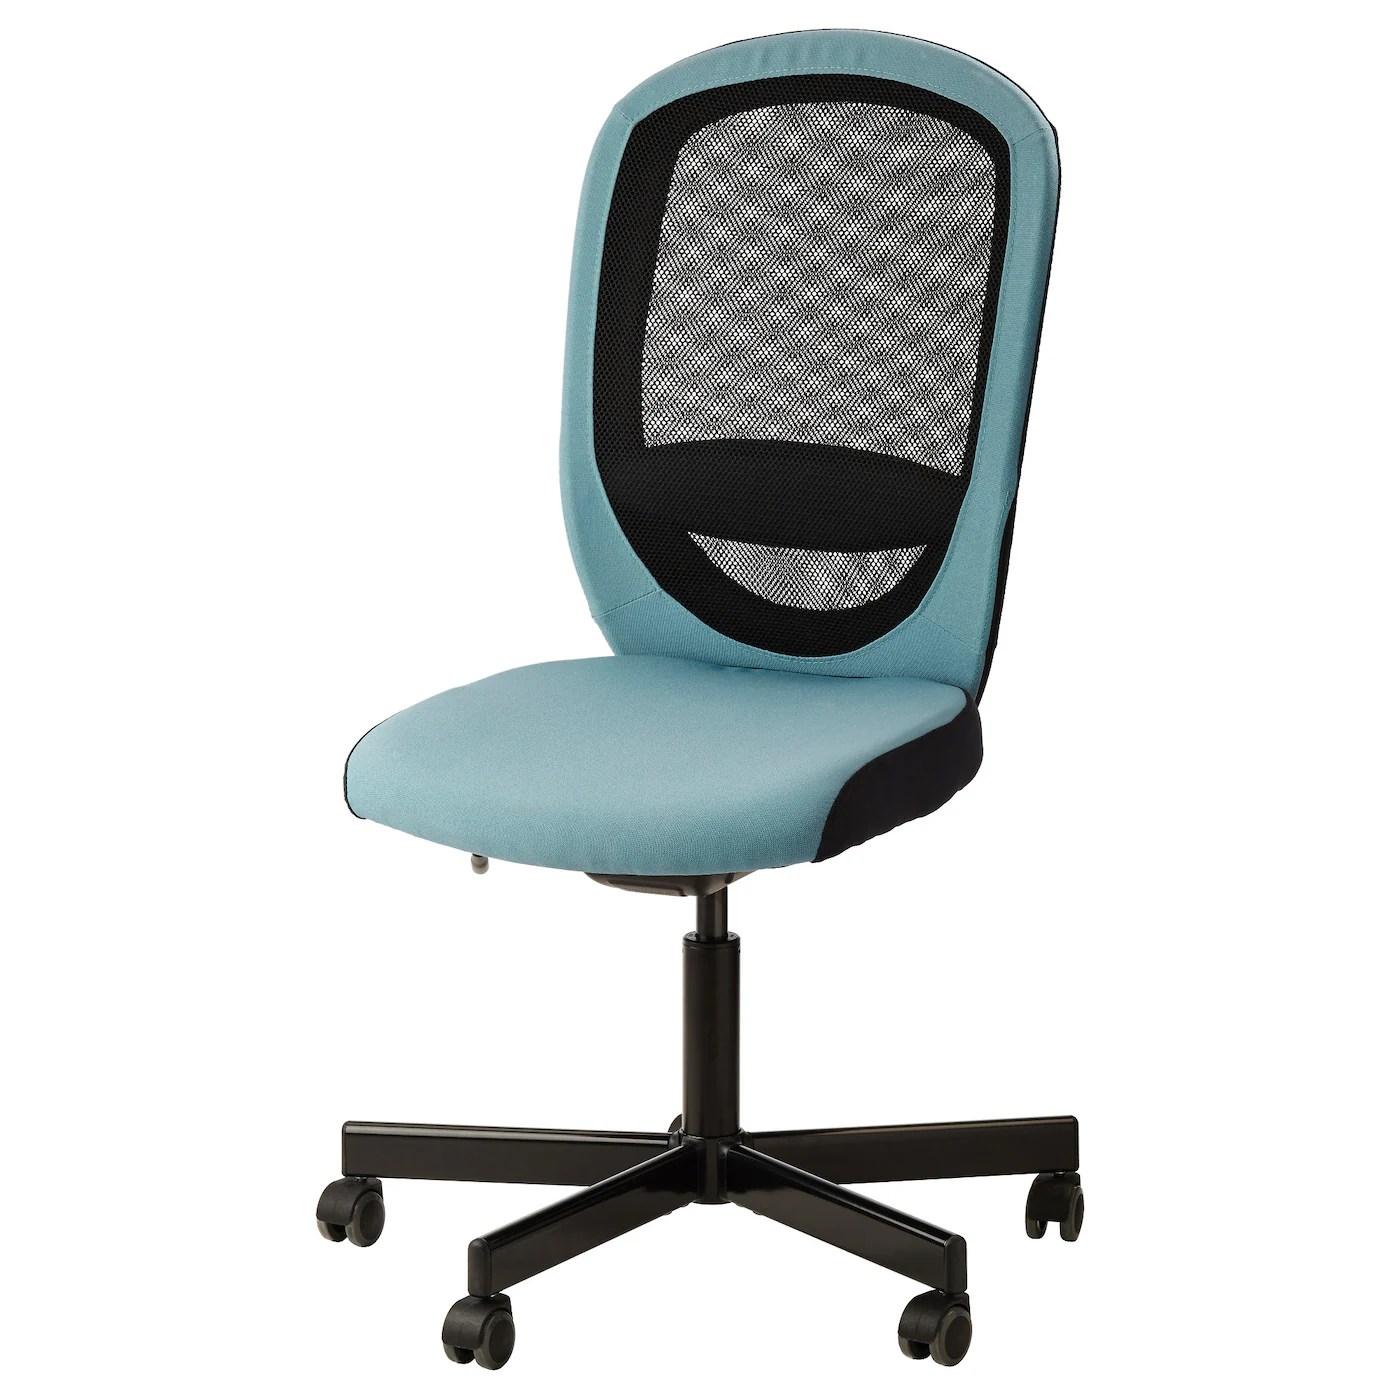 desk chair dublin red dining chairs nz office ikea ireland